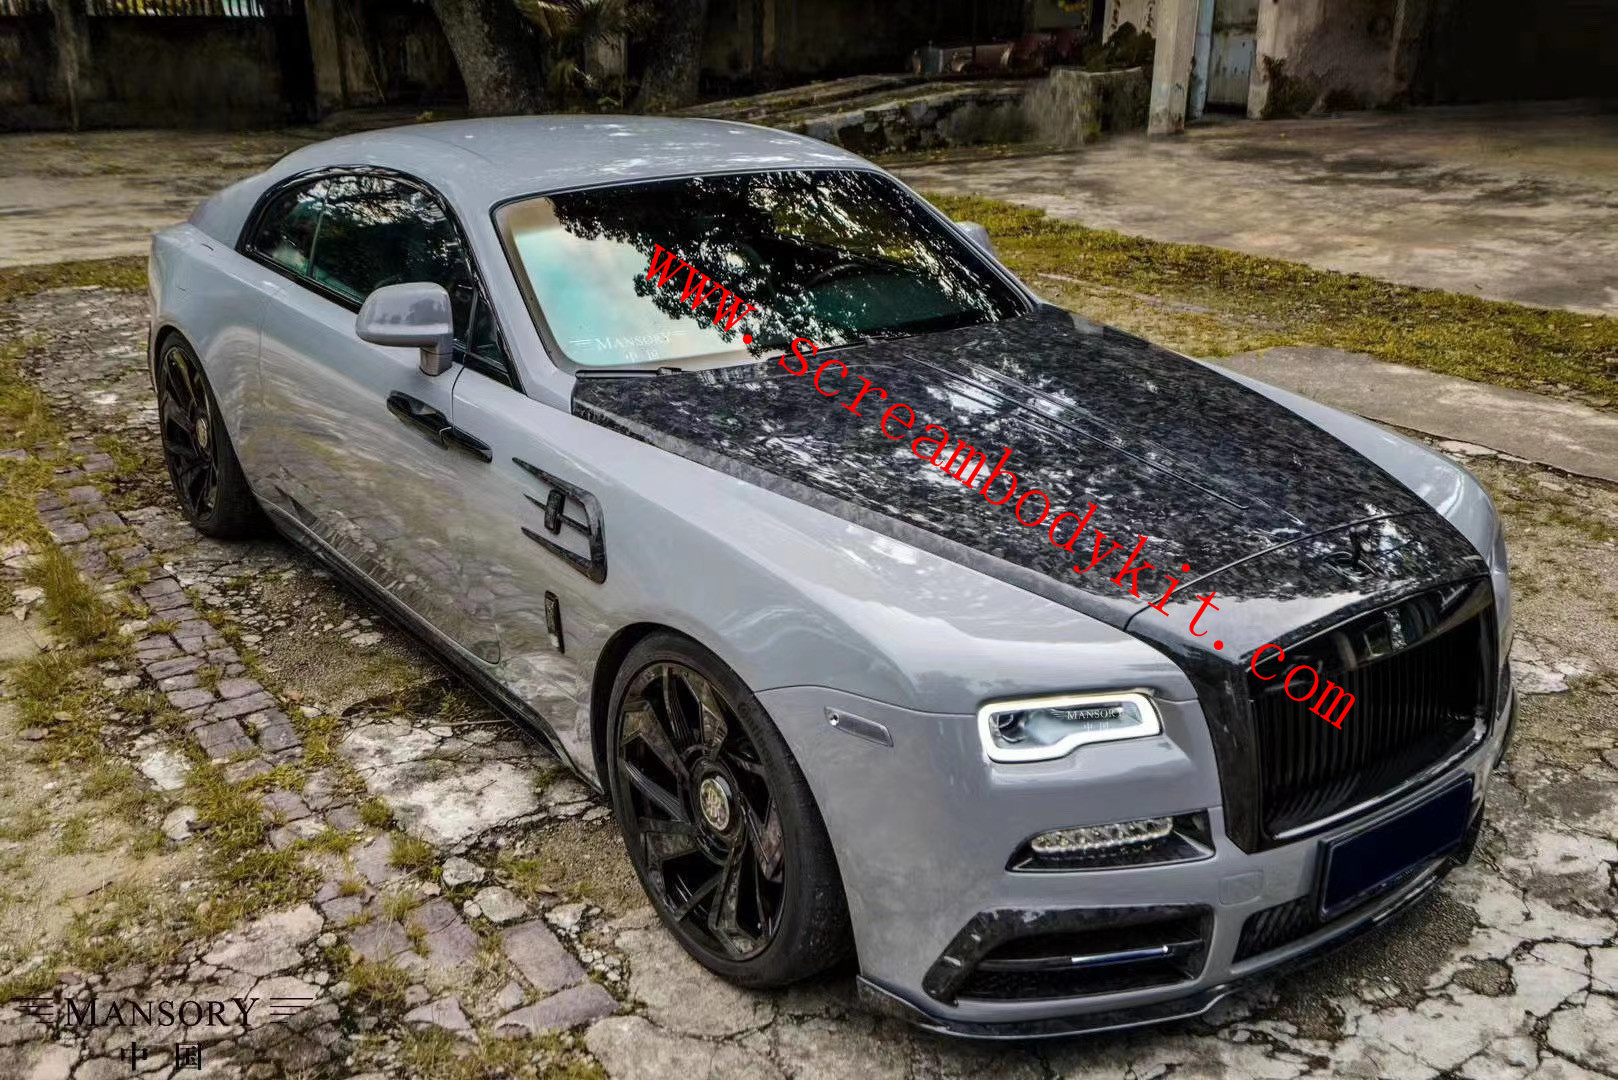 Rolls-Royce Wraith body kit mansory front bumper rear bumper side skirts